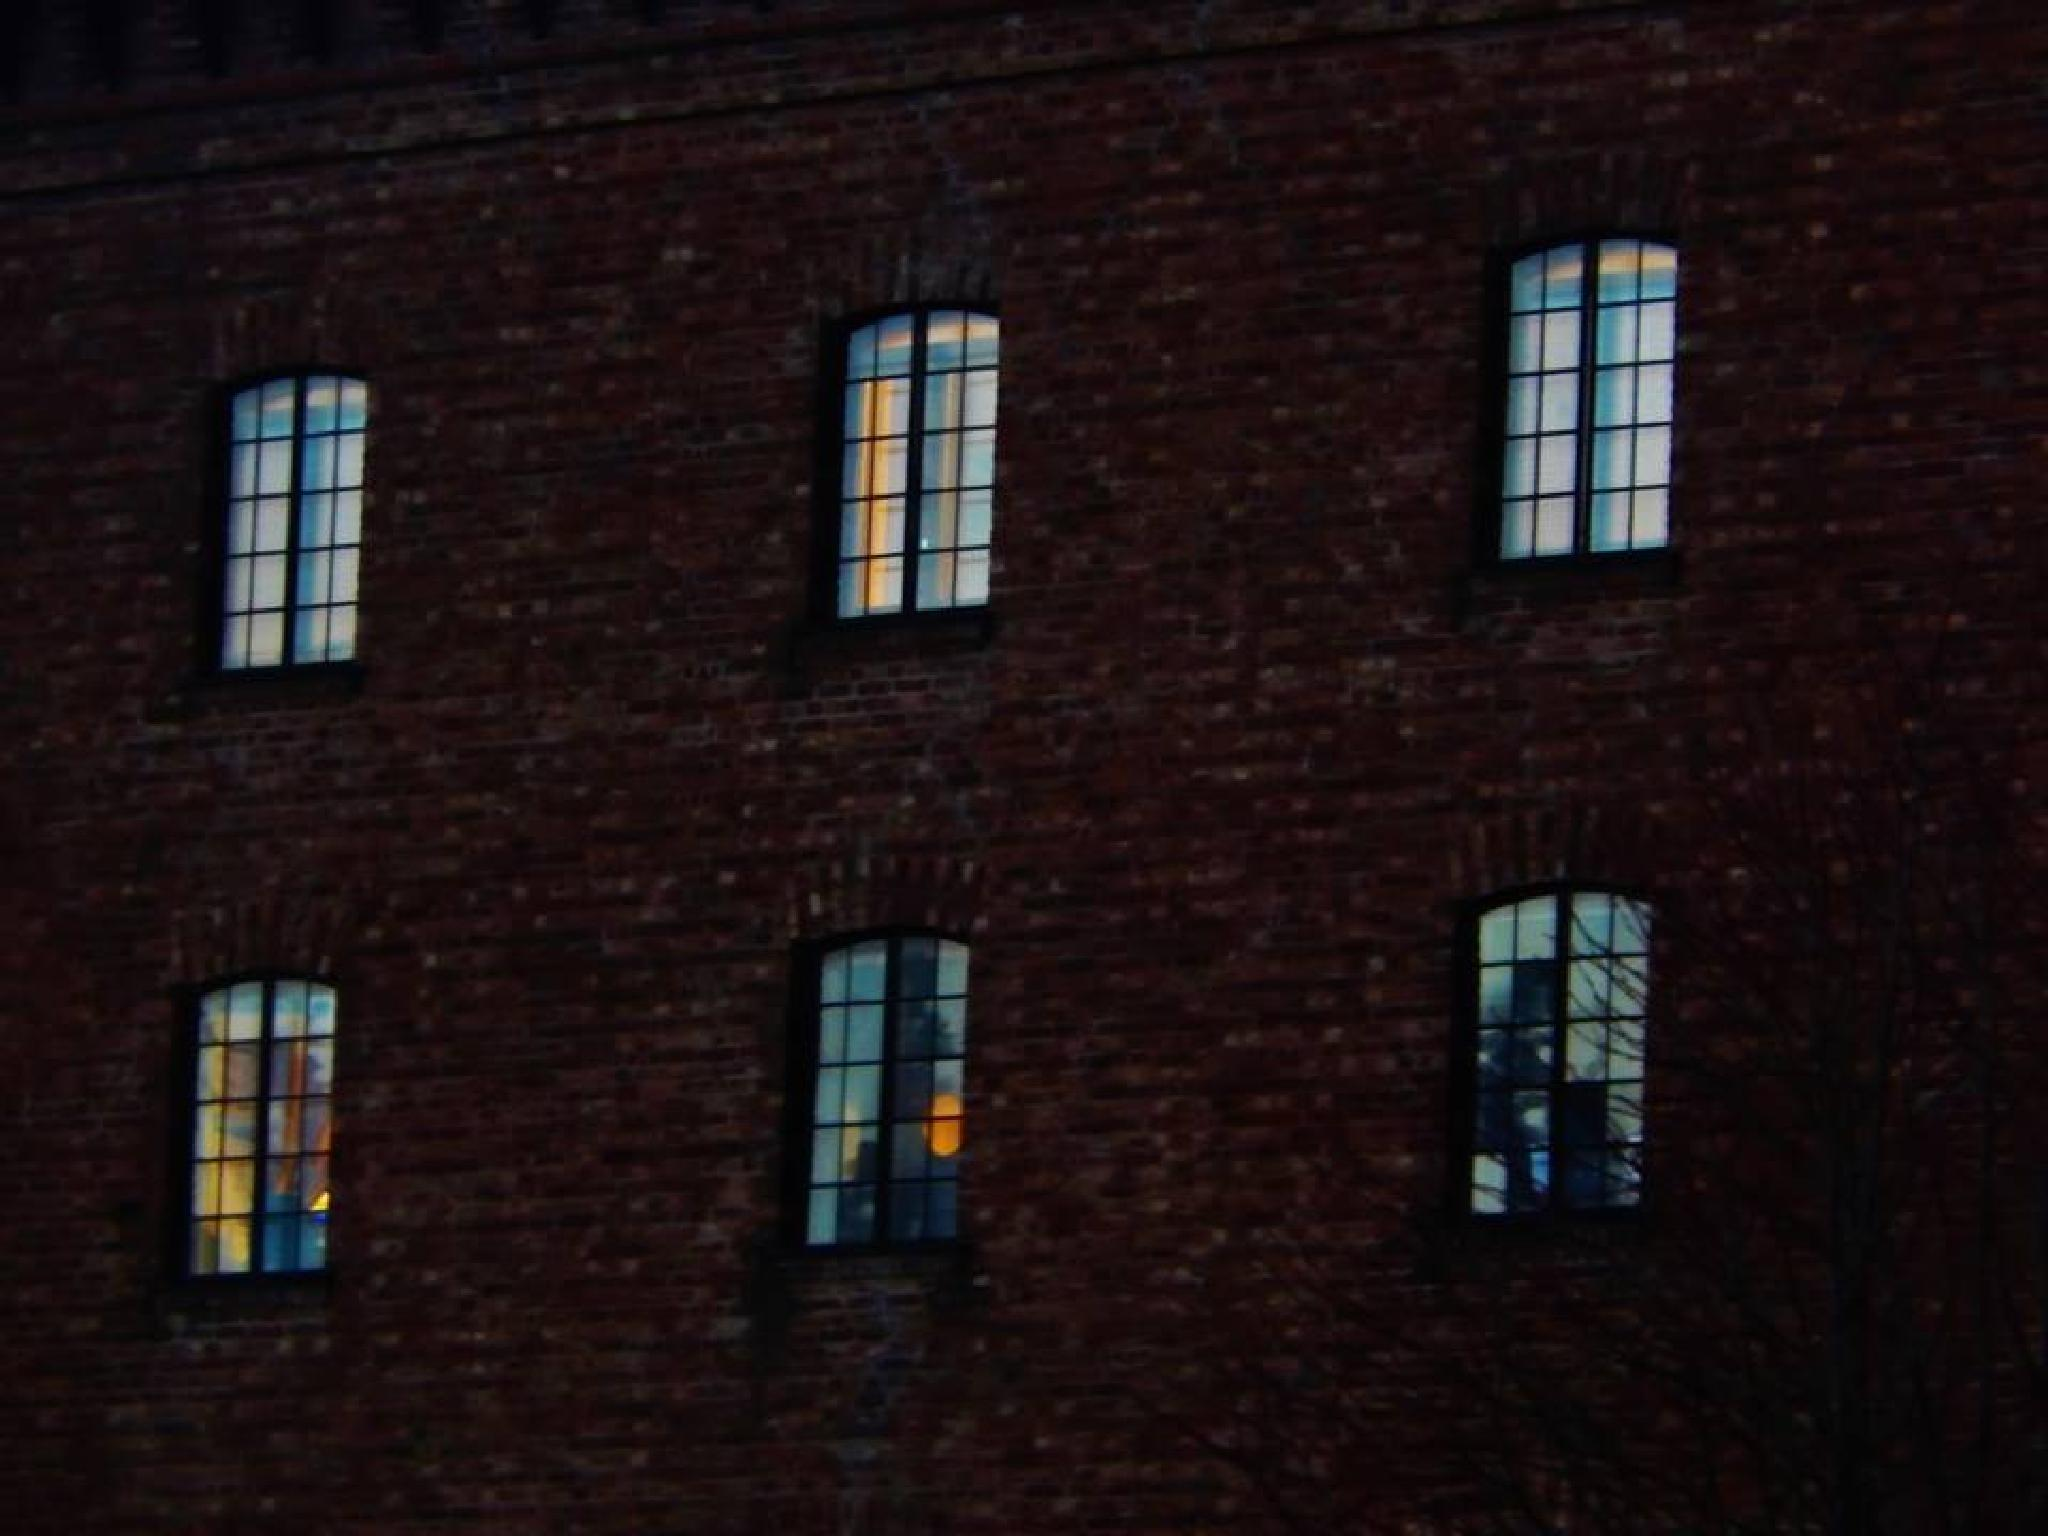 LIGHTNING  by dag.lindberg